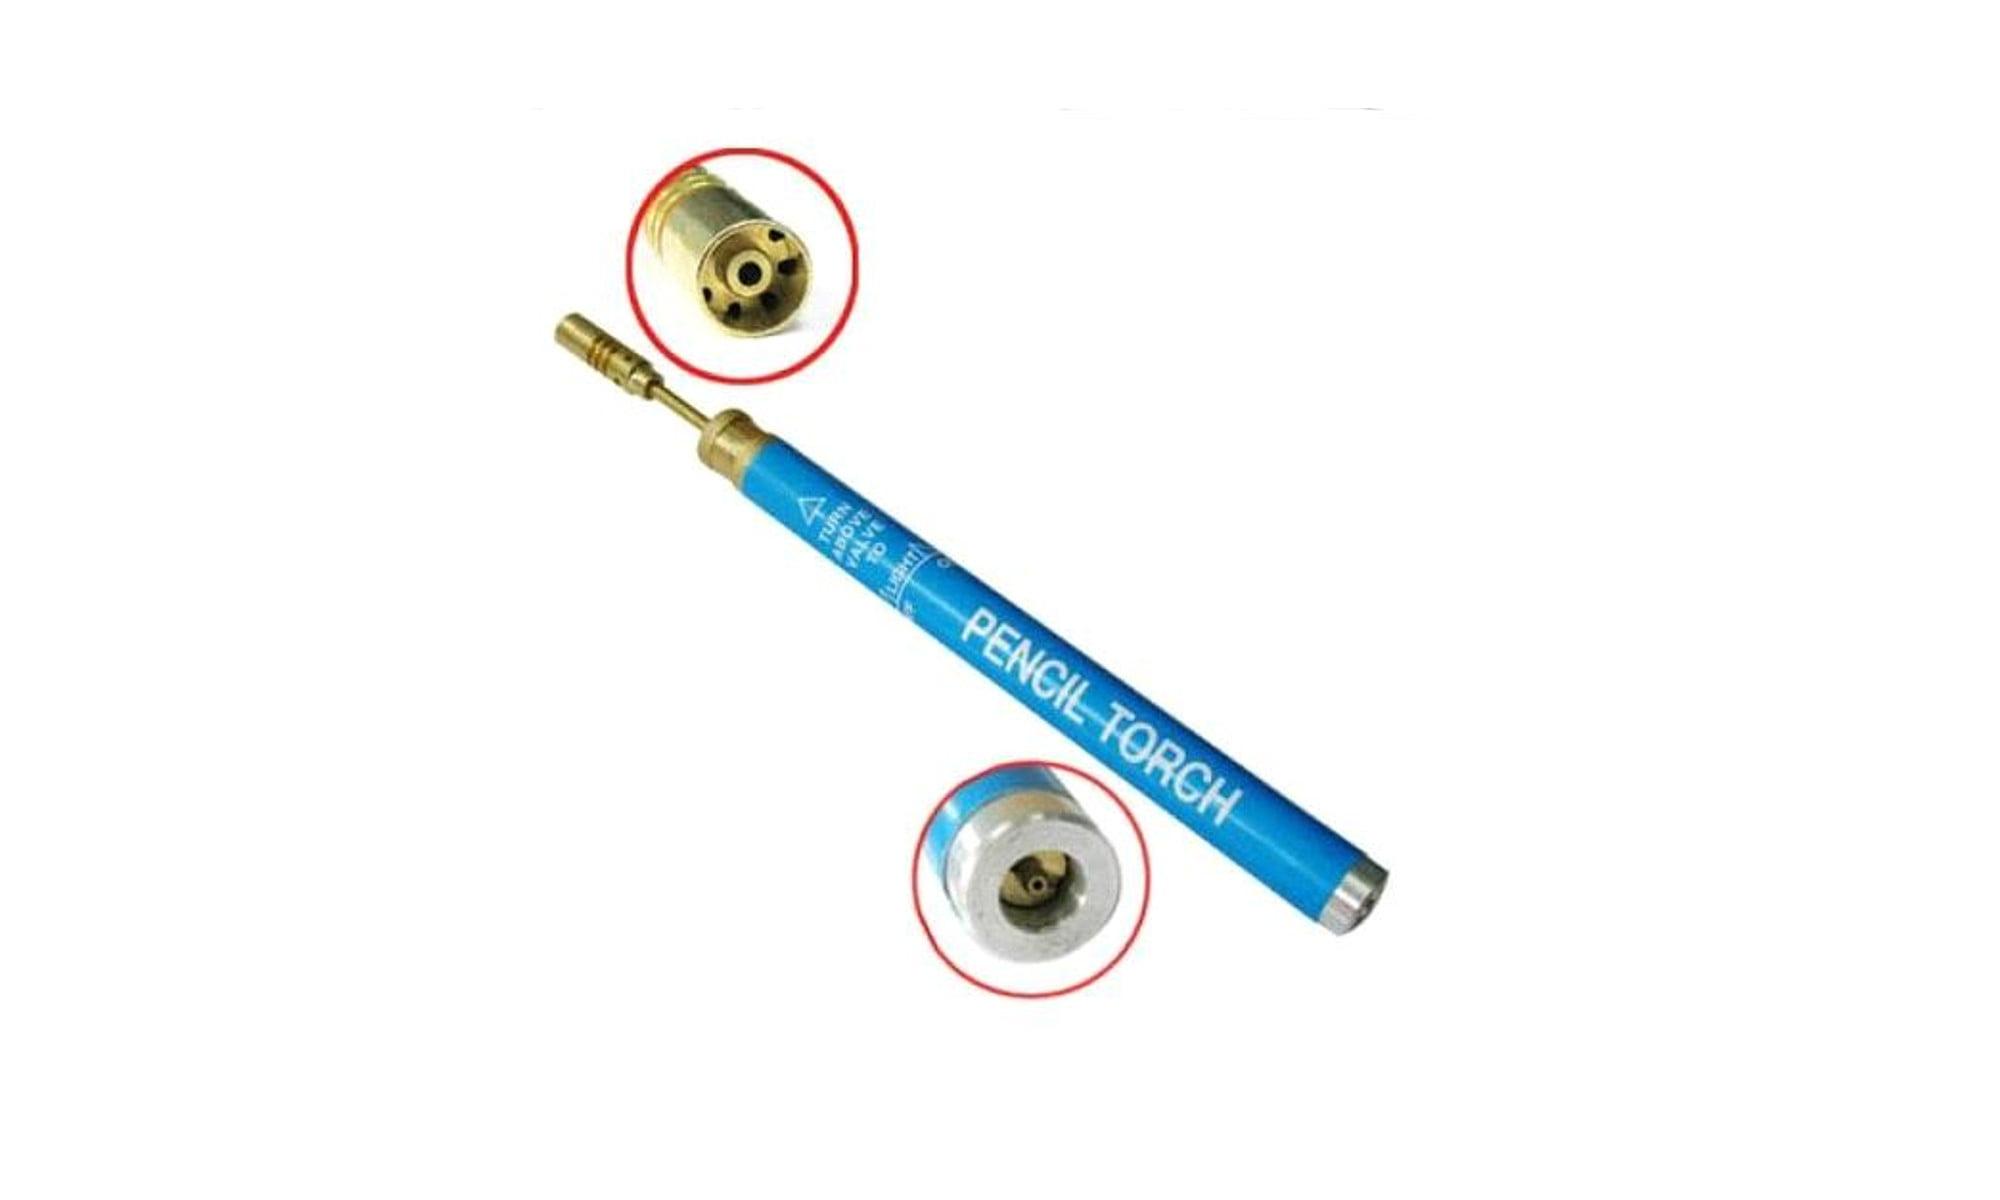 Pencil Torch Butane fuel